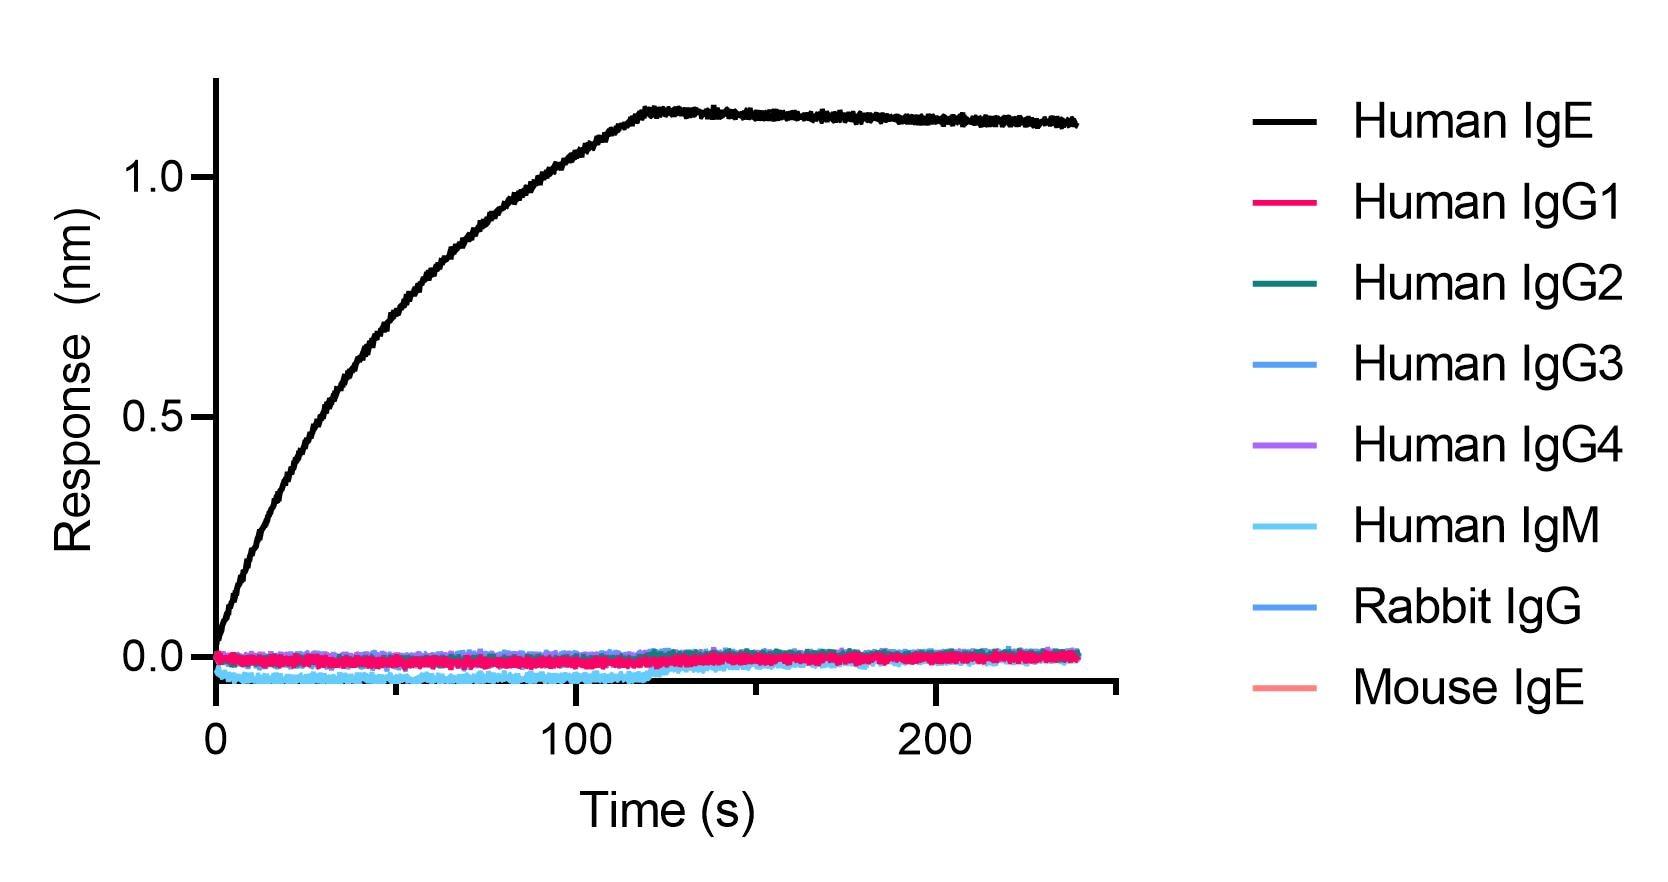 BLI binding kinetics of human, mouse and rabbit antibodies. 20 nM of human, mouse and rabbit antibodies were immobilized using Nano-CaptureLigand human IgE, VHH, biotinylated on FortéBio Streptavidin (SA) Biosensors. Only human IgE antibody is captured by the Nano-CaptureLigand with negligible dissociation.